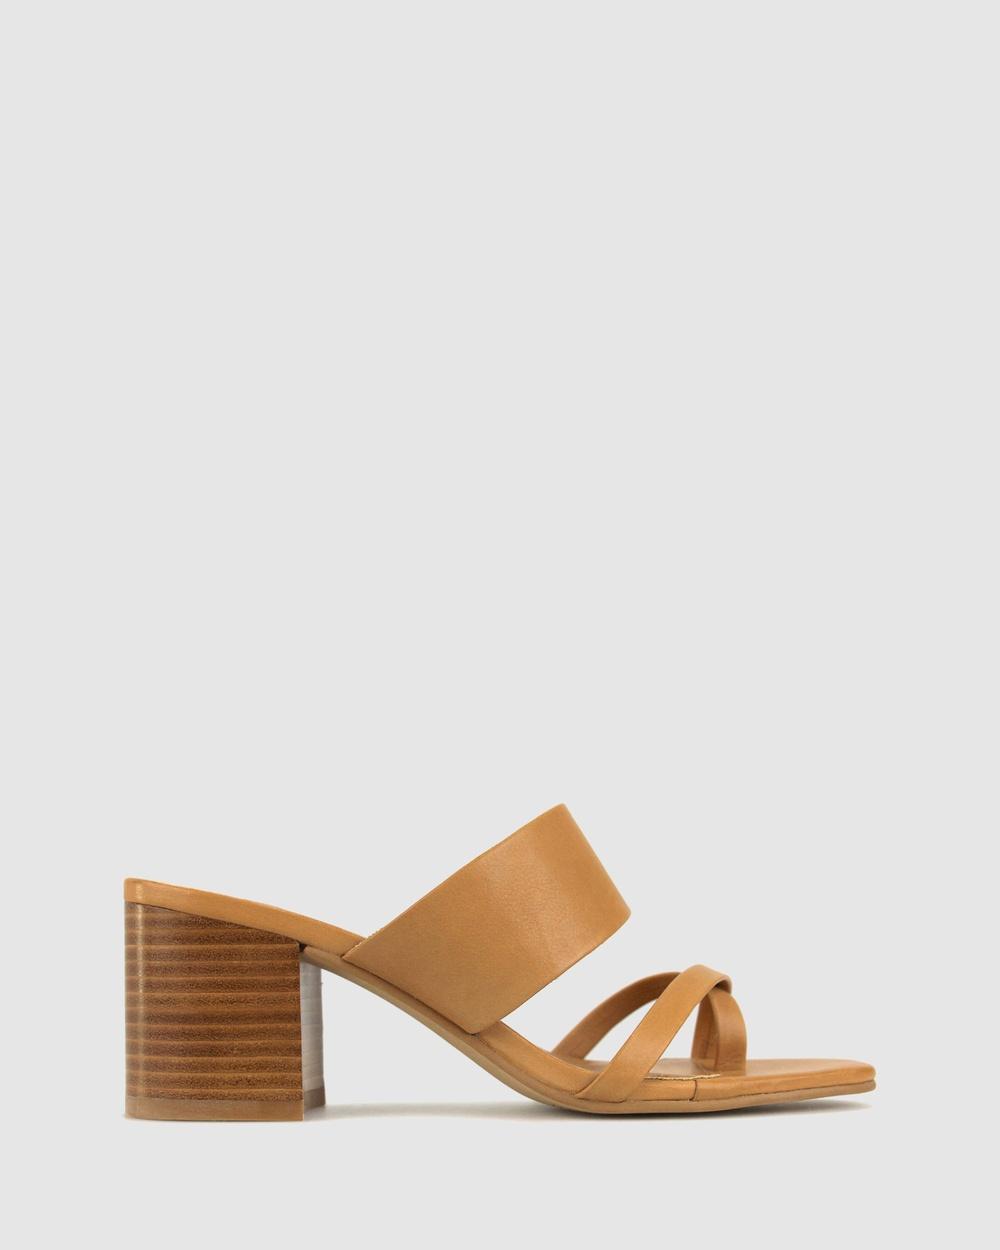 Betts Casa Block Heel Mules Sandals Tan Australia